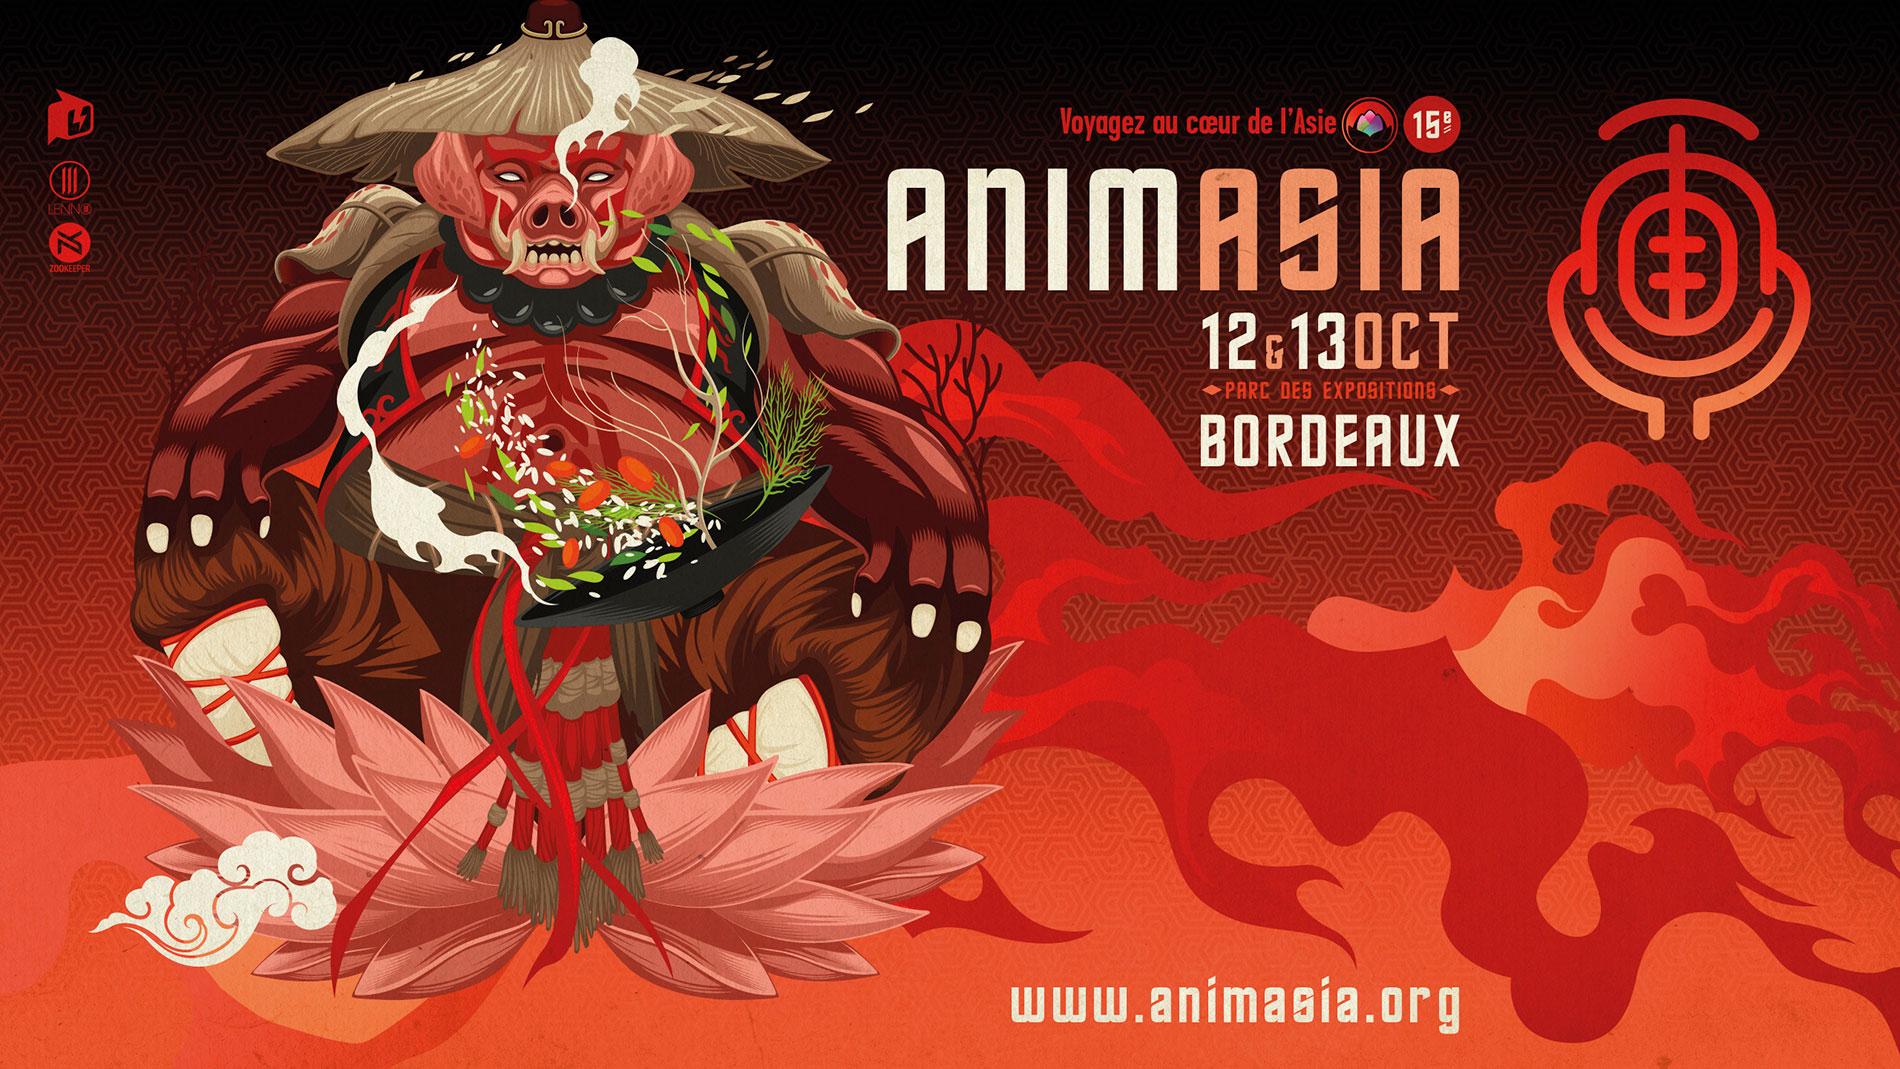 Festival ANIMASIA 2019 Bordeaux